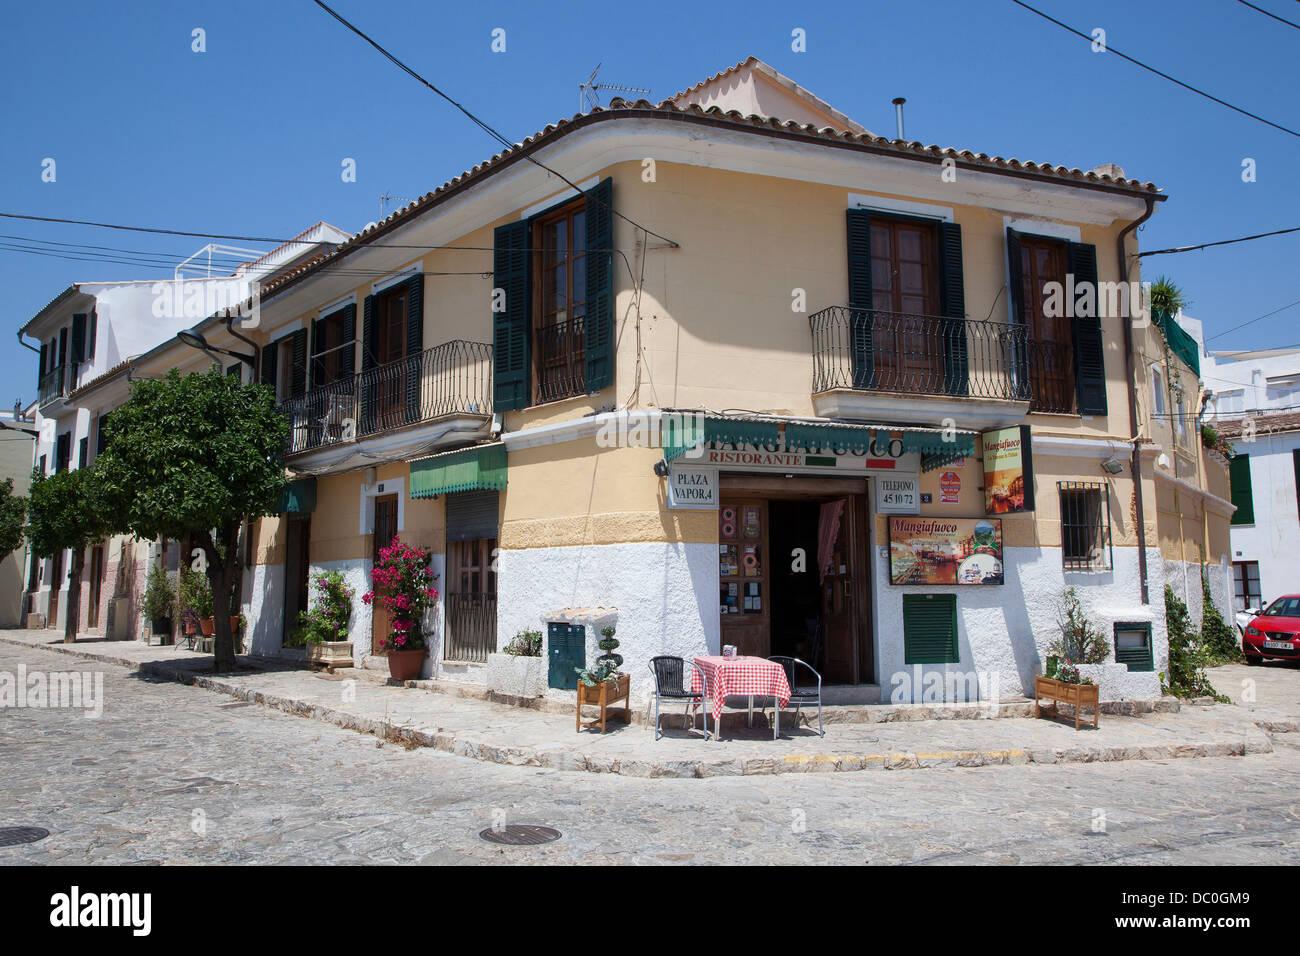 Street bar on Plaza Vapor in Palma, Majorca - Stock Image